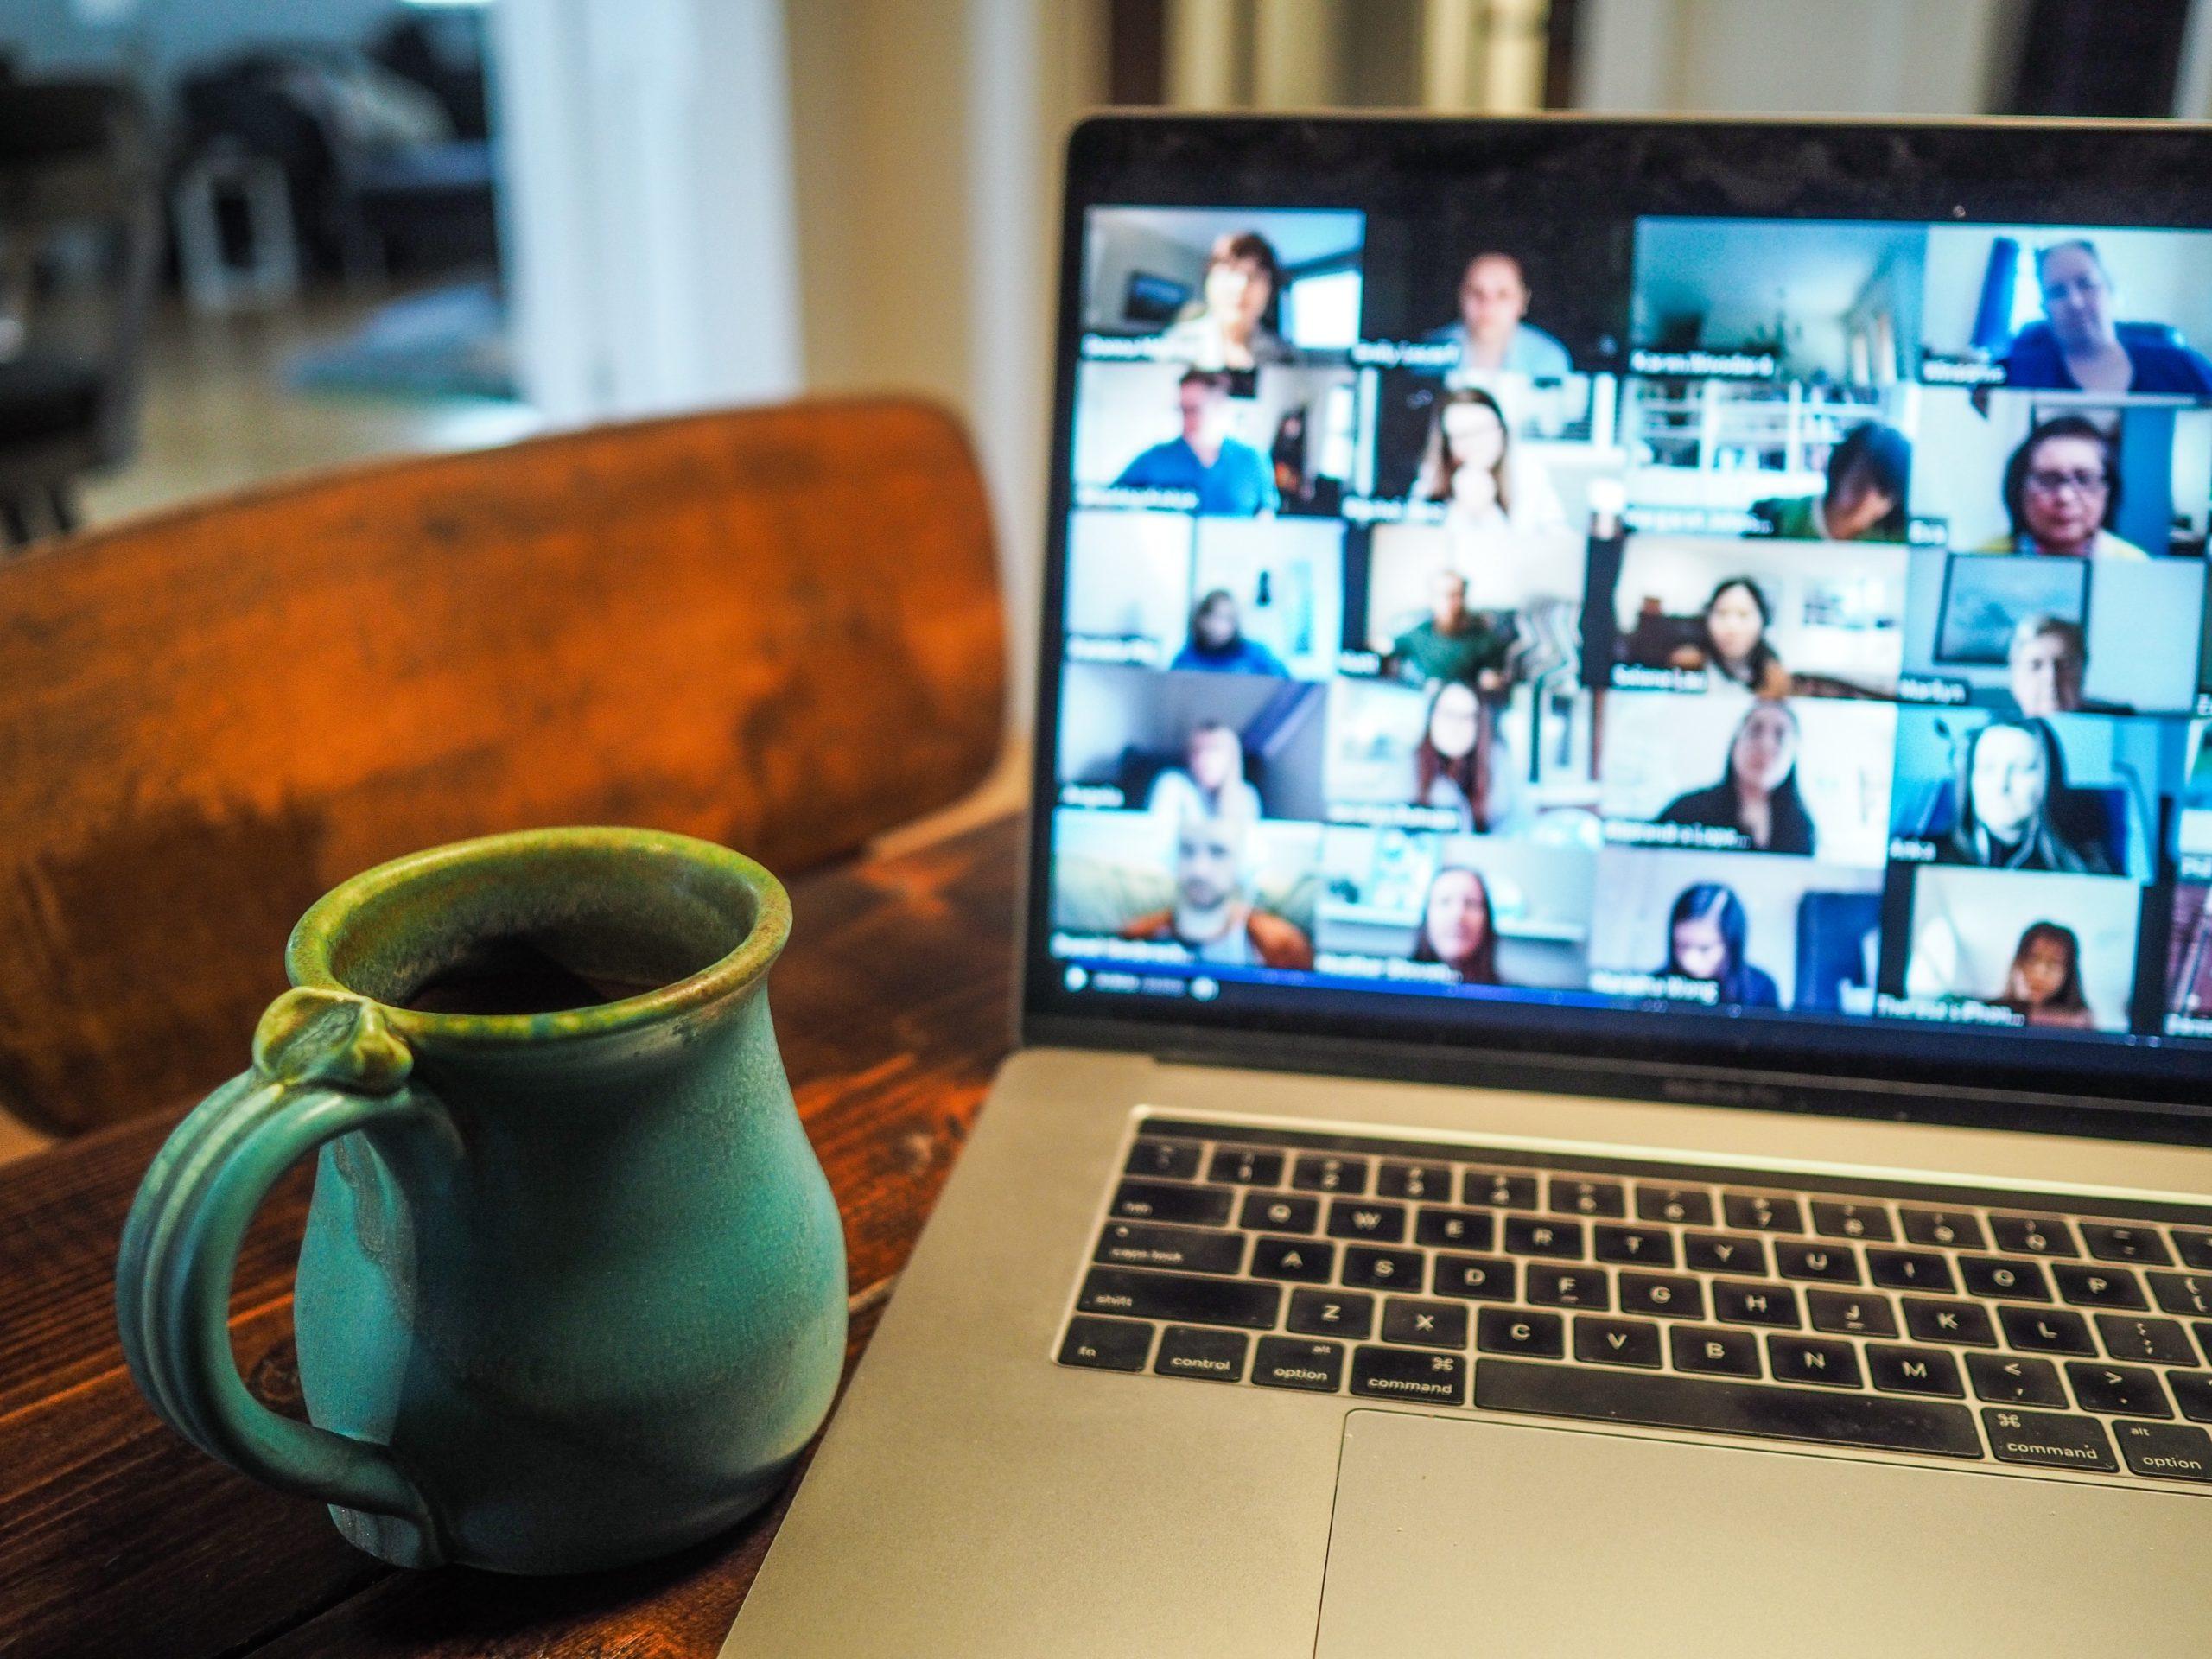 present-meetings-virtually